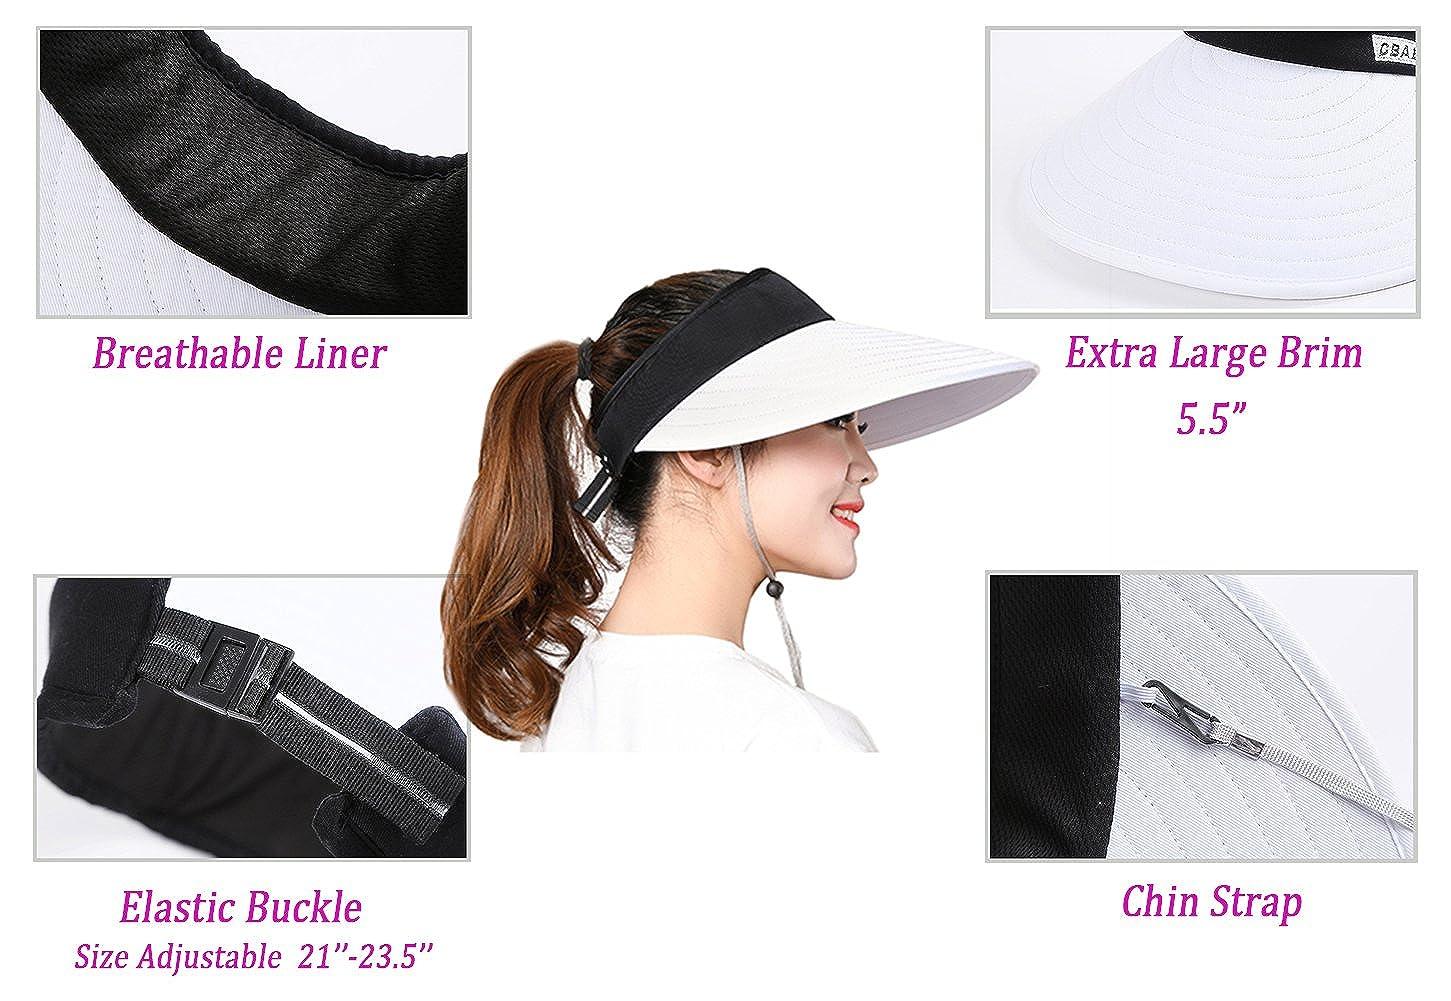 67af0e4e1 Sun Visor Hats for Women, Large Brim UV Protection Summer Beach Cap,  5.5''Wide Brim